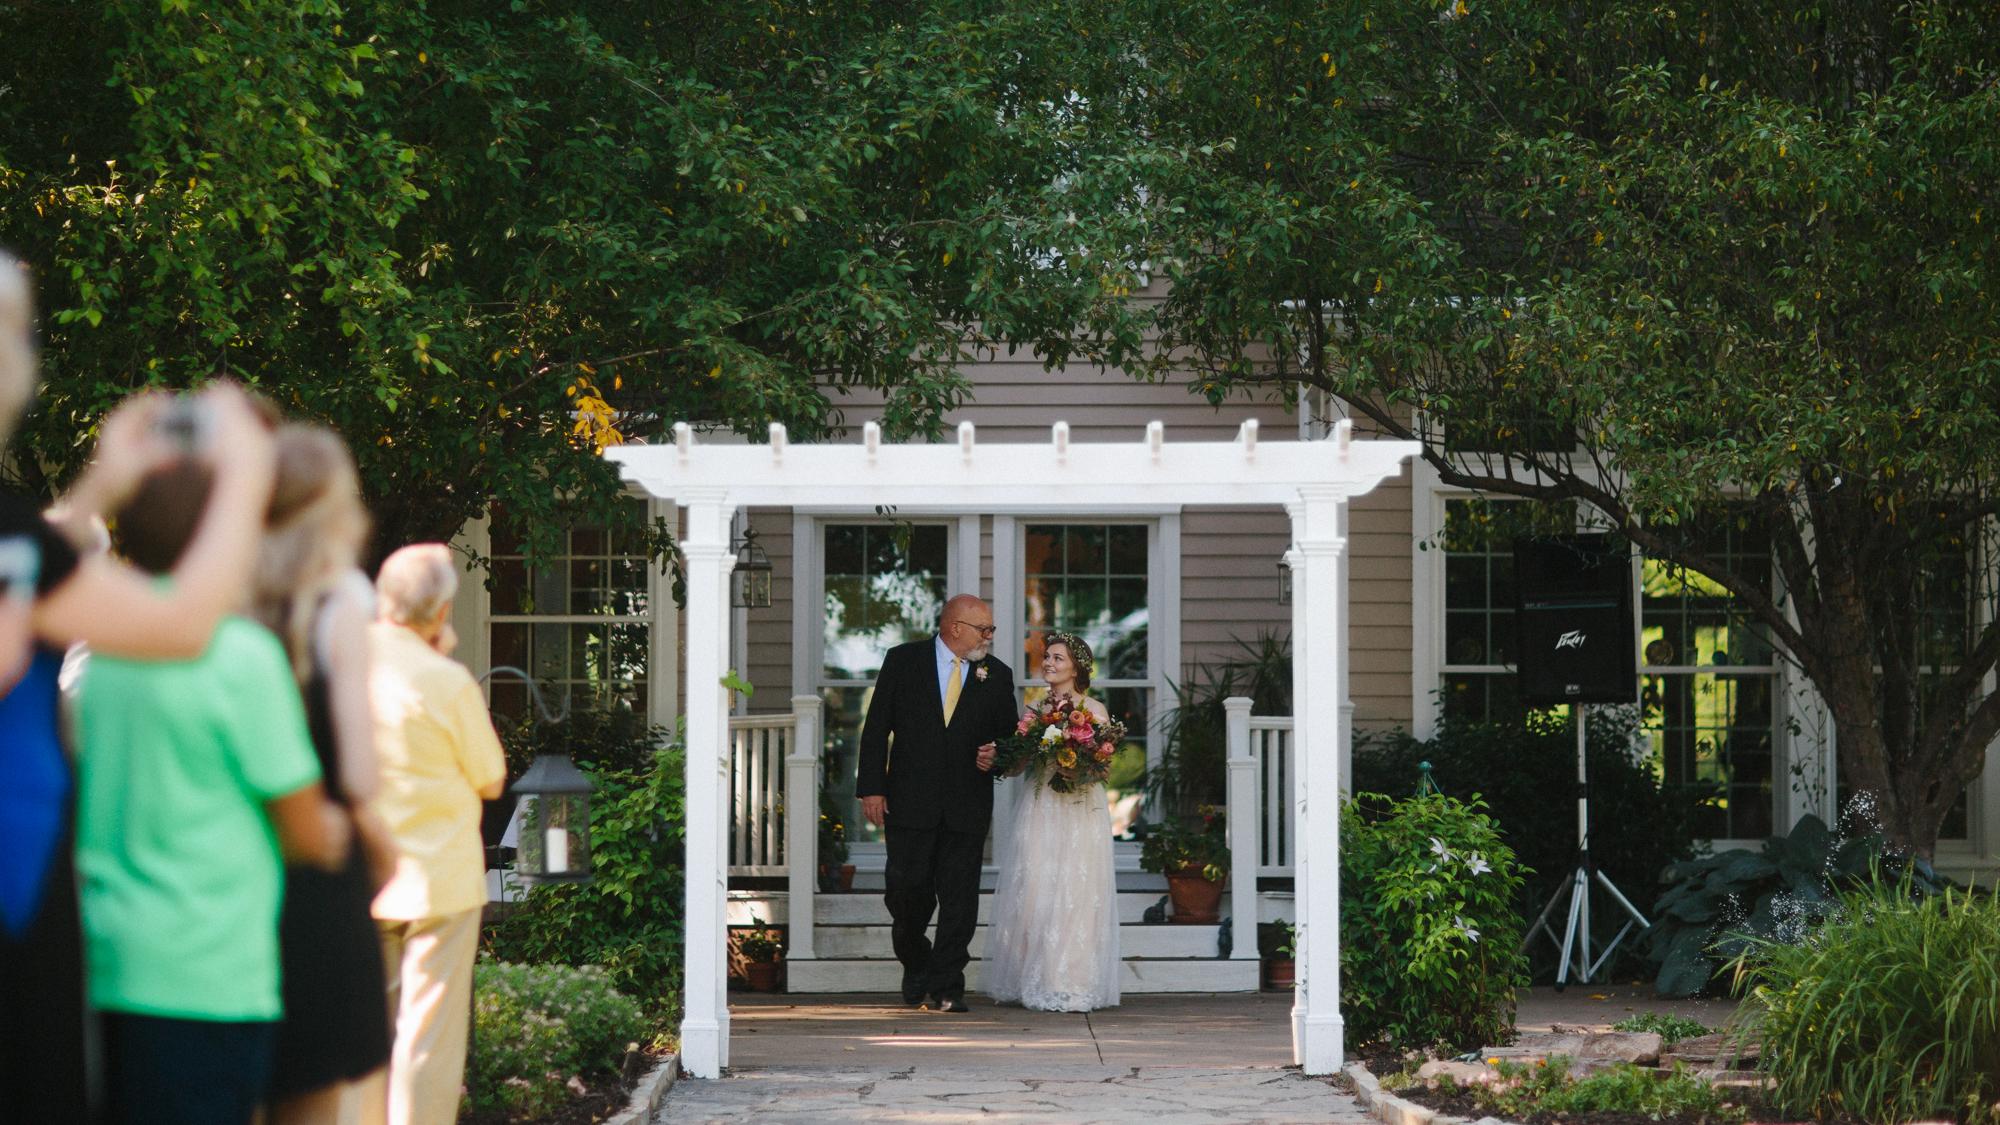 alec_vanderboom_kansas_city_mo_wedding_photos-0041.jpg